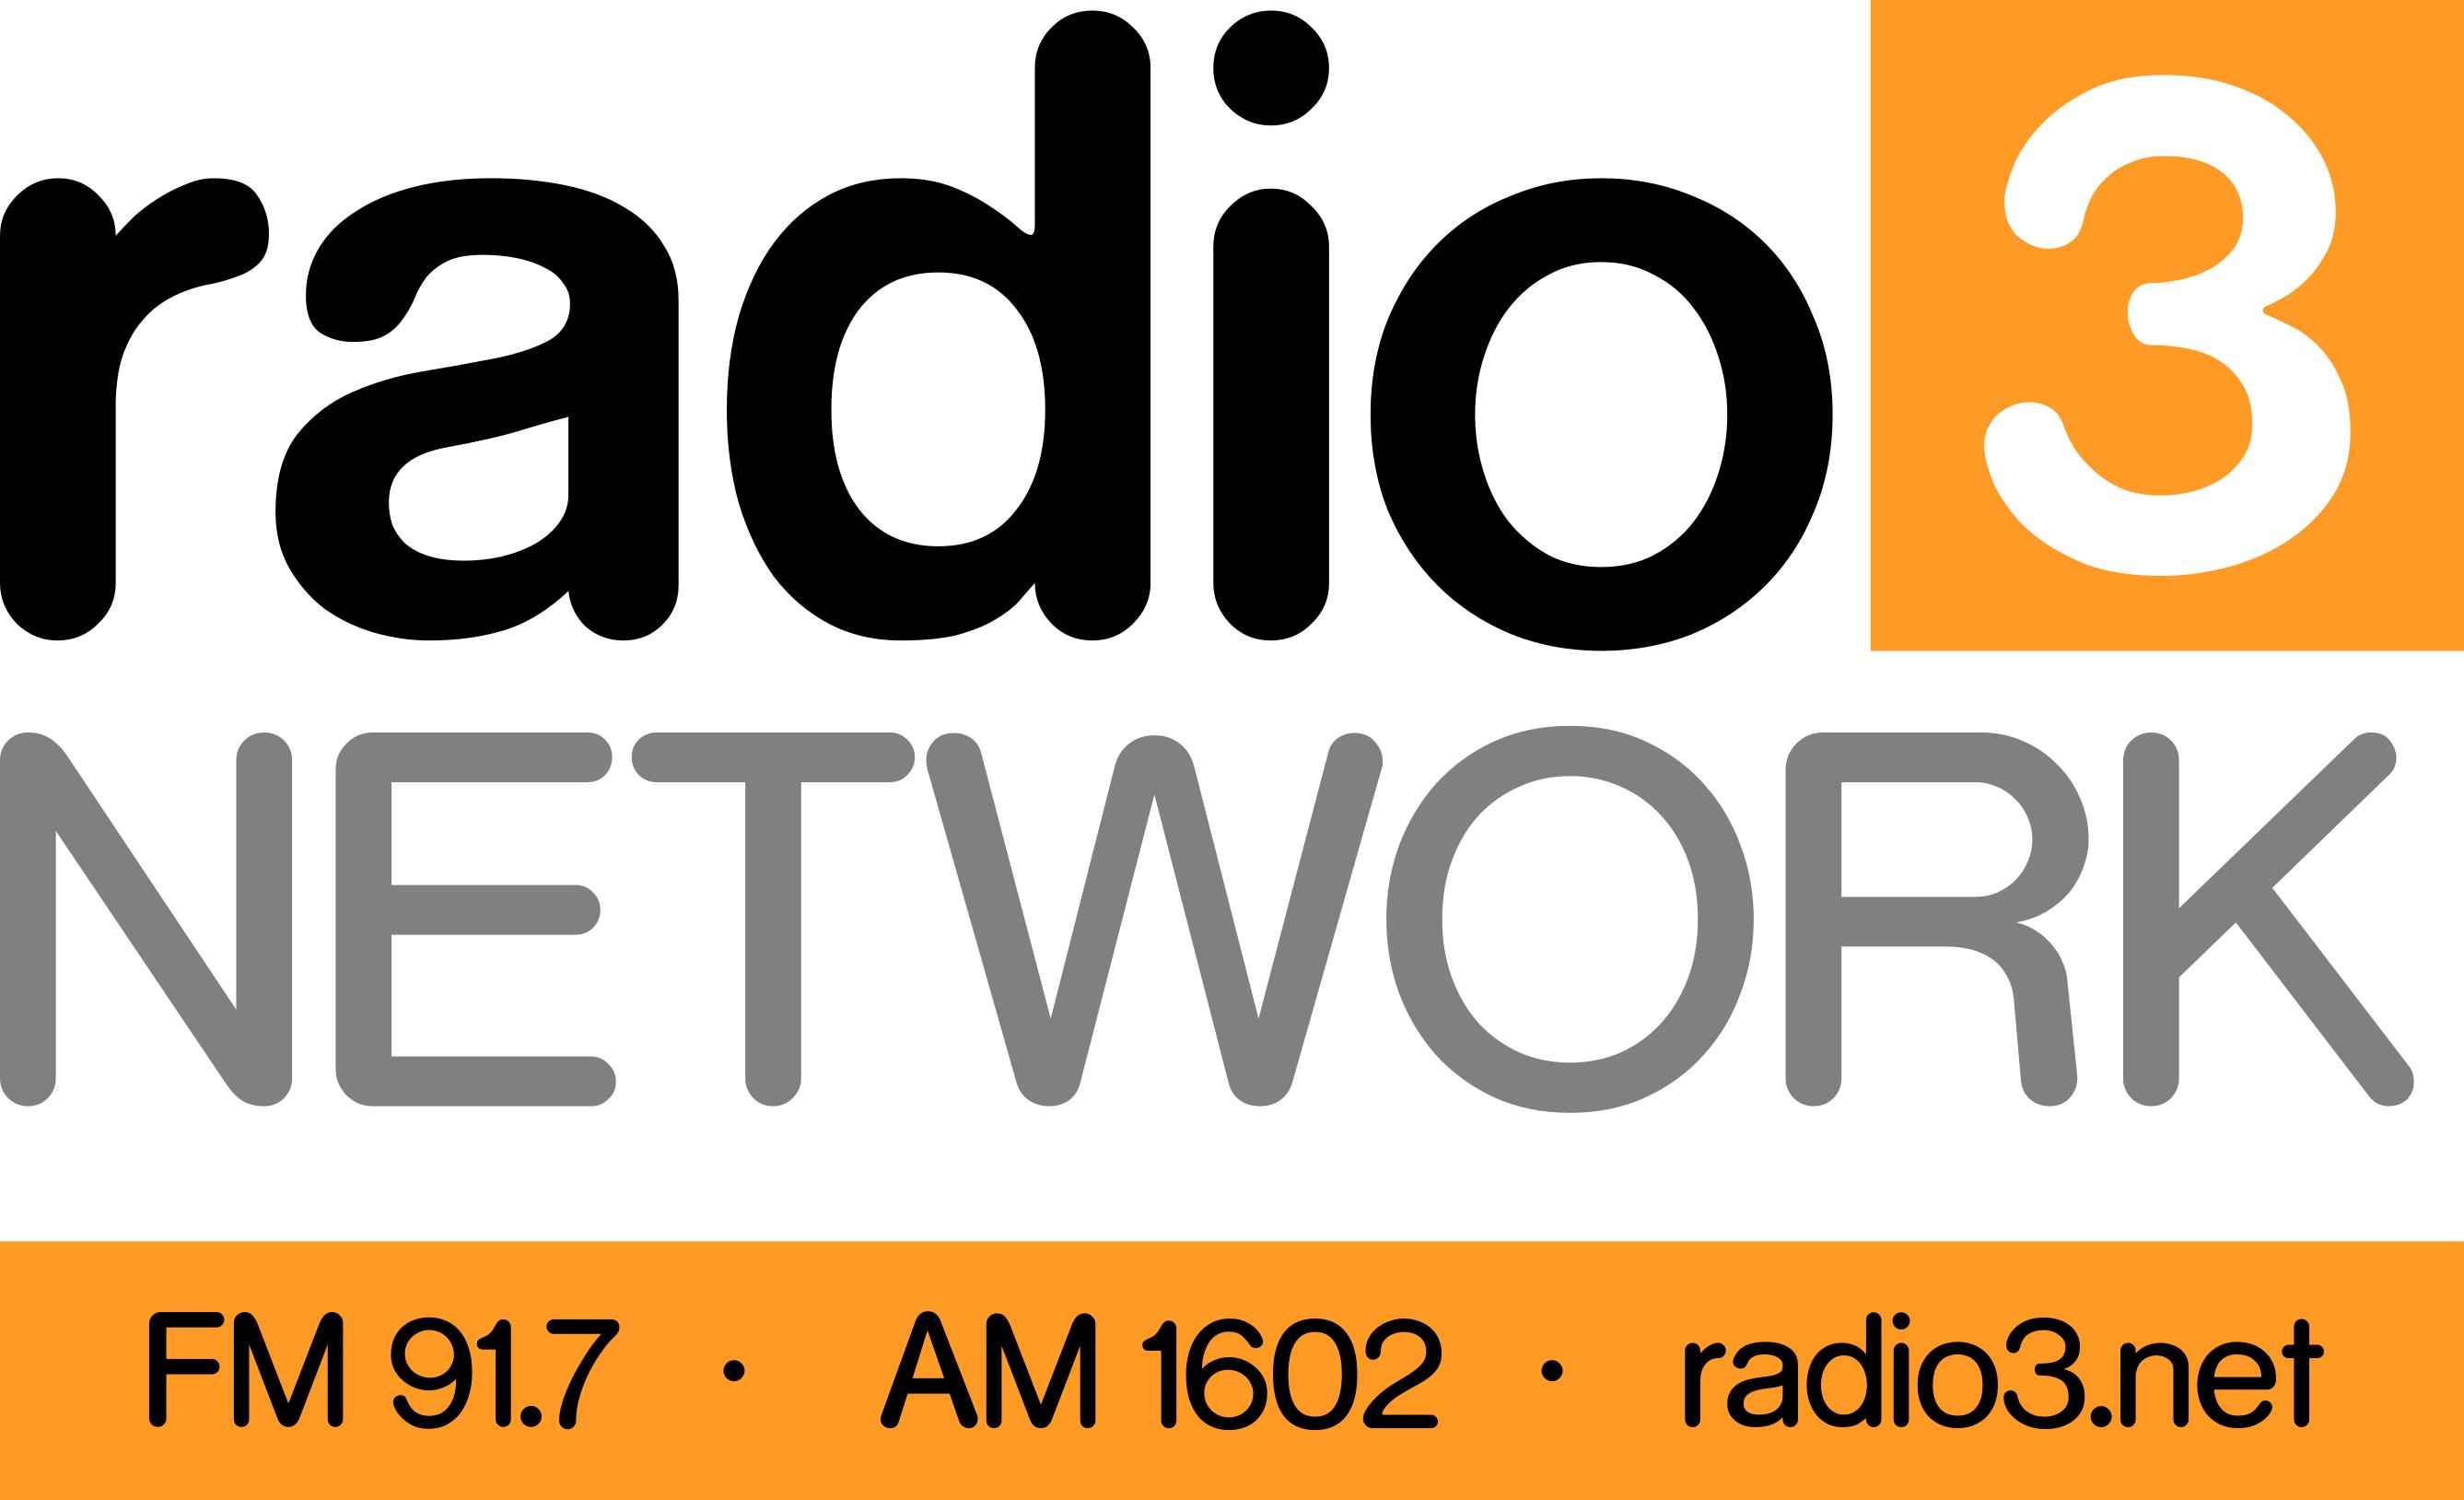 Radio 3 Network